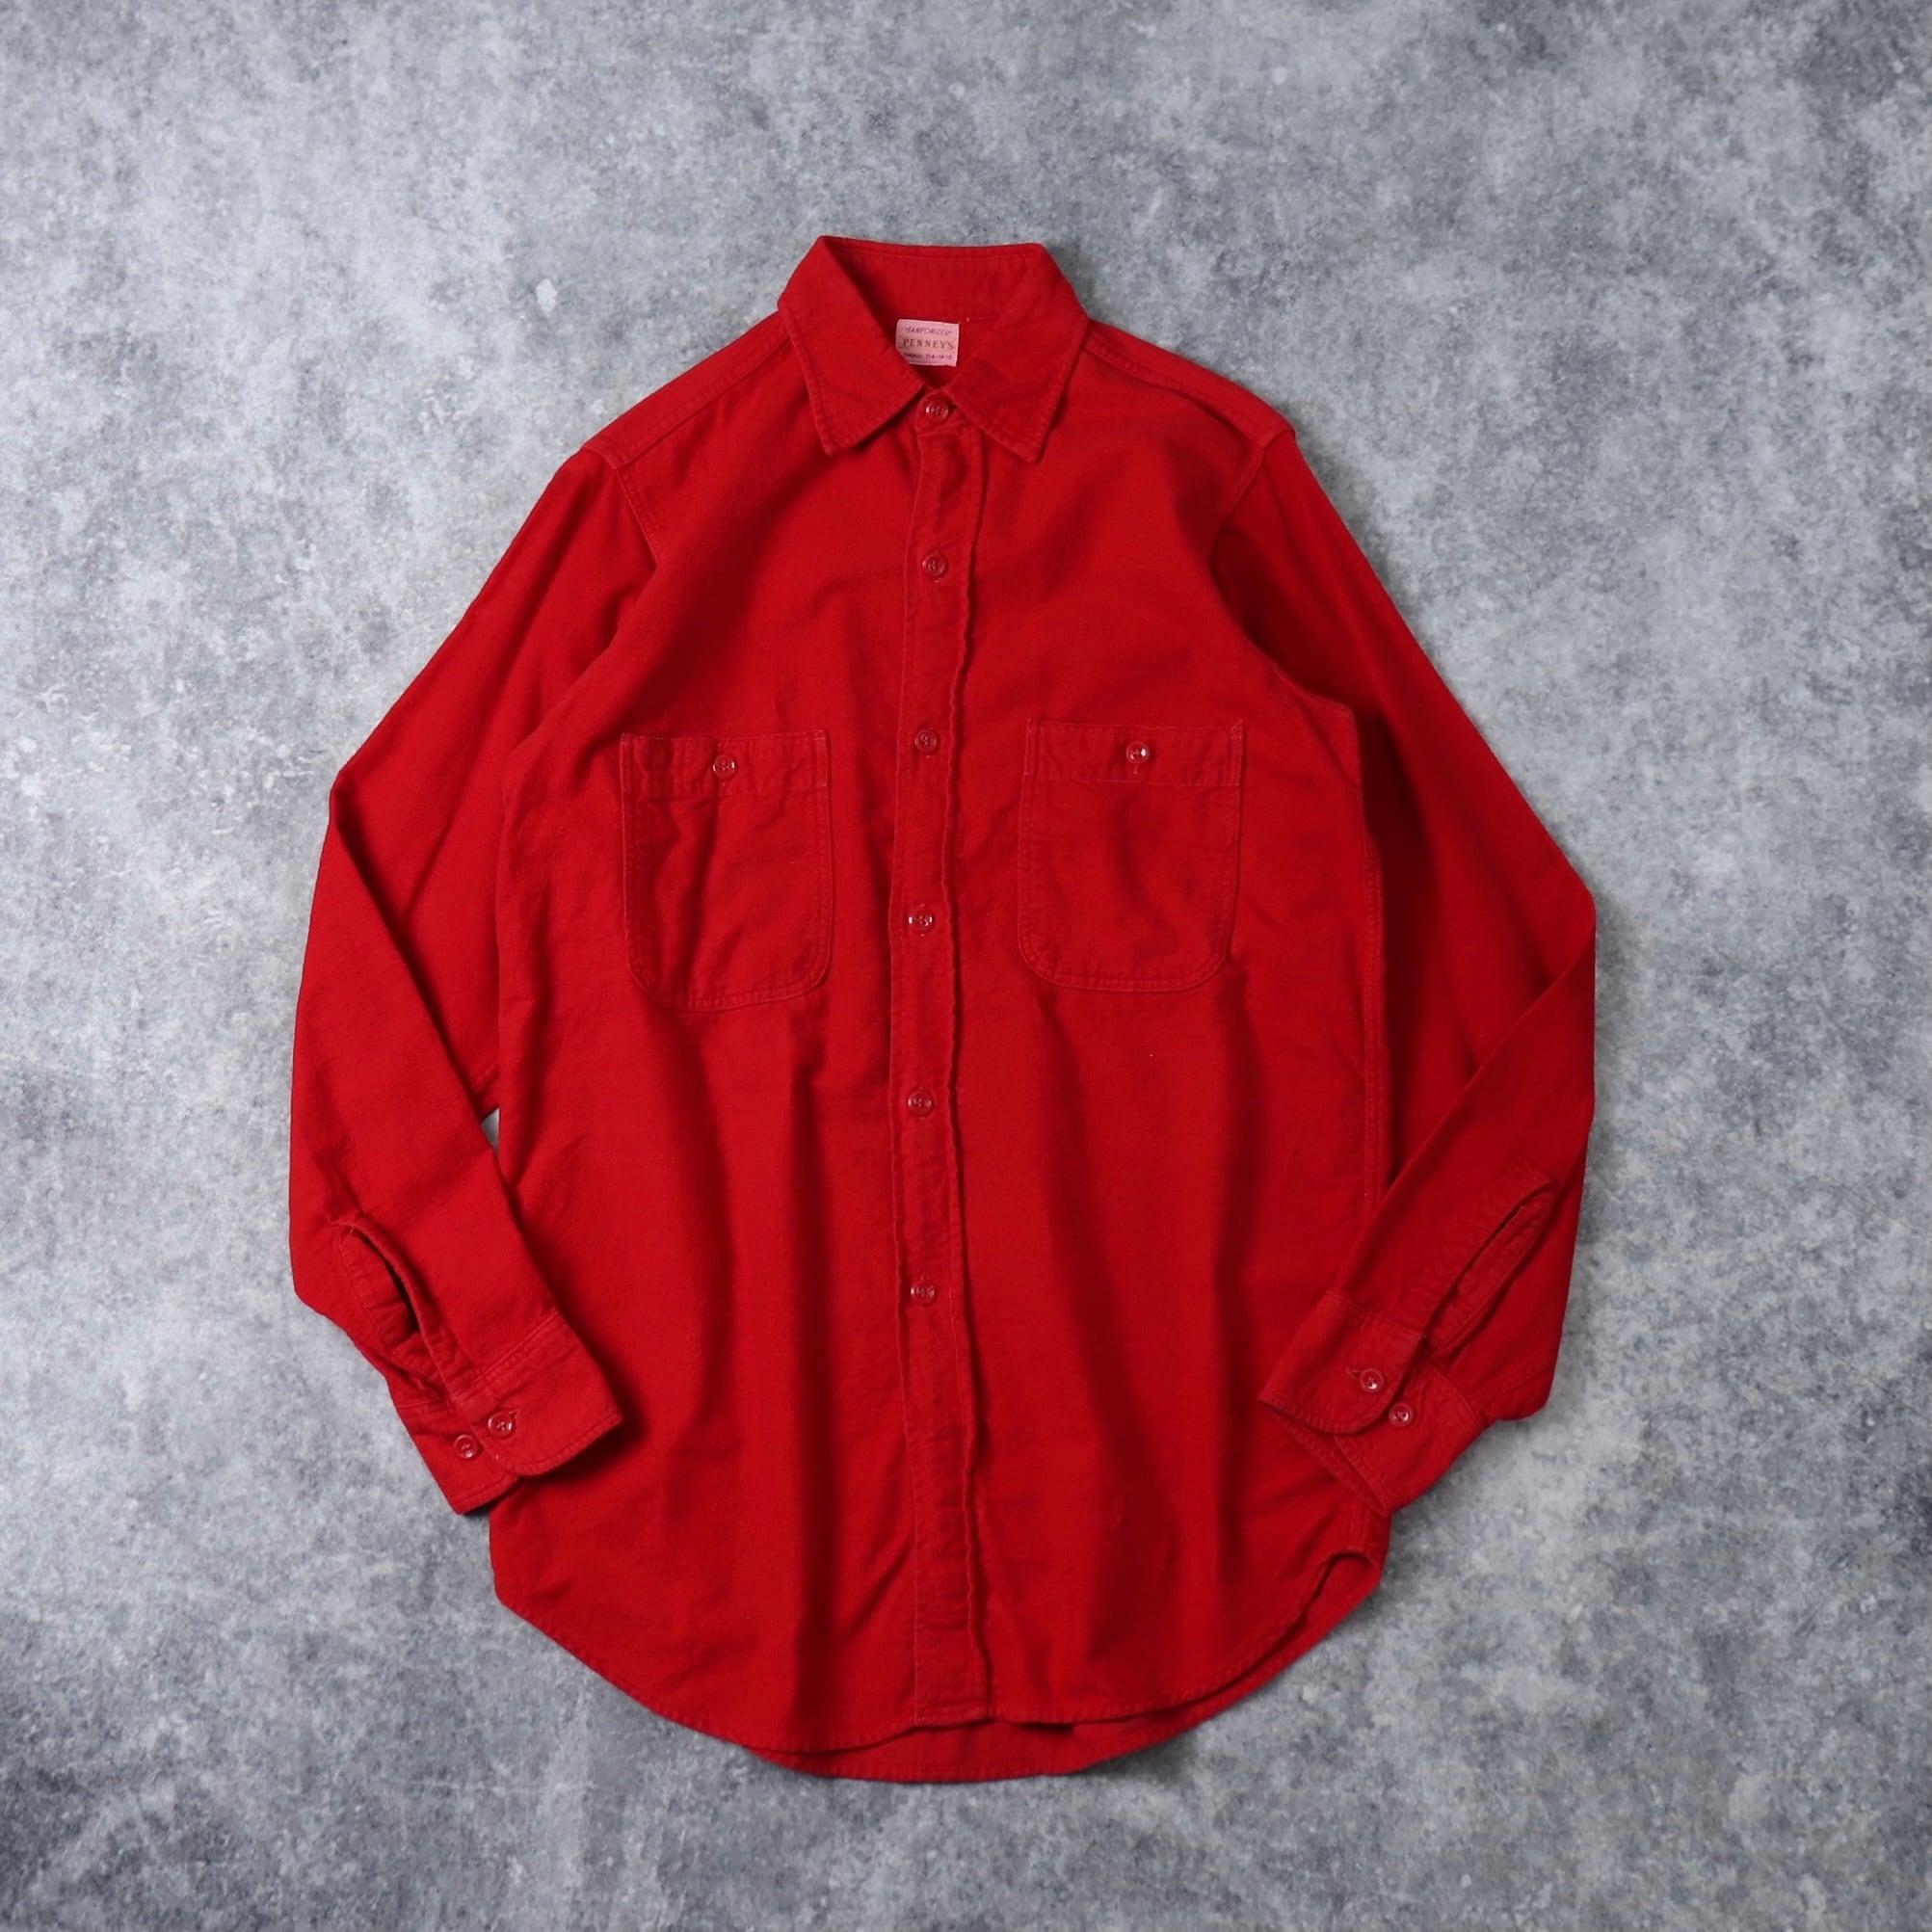 50's〜60's Penny's Flannel shirt 50年代〜60年代 ヴィンテージ  ペニーズ ネルシャツ コットンネル フランネルシャツ 古着 A562